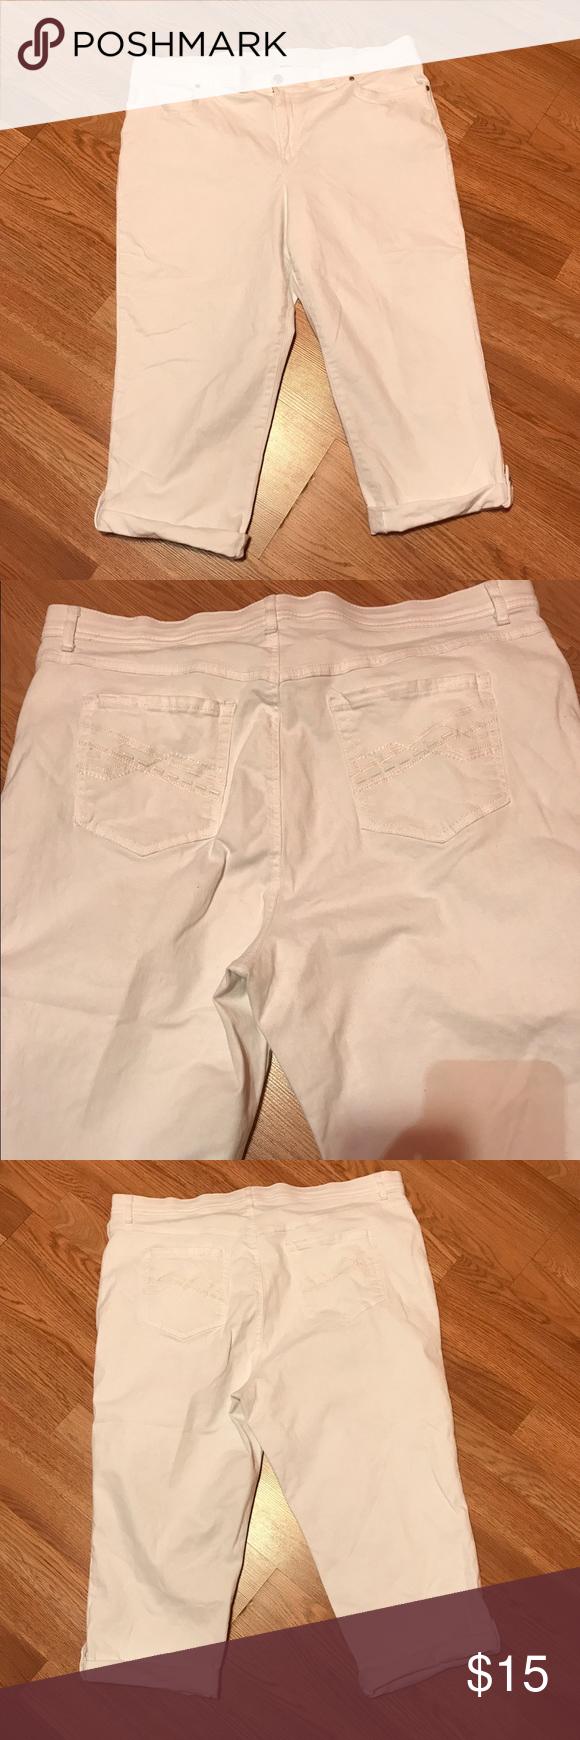 "Gloria Vanderbilt Capris Pants Good condition. No flaws. Has spandex. Elastic at the waist & button closure. Zipper fly. Inseam 19"" Size 18W Gloria Vanderbilt Pants Capris"